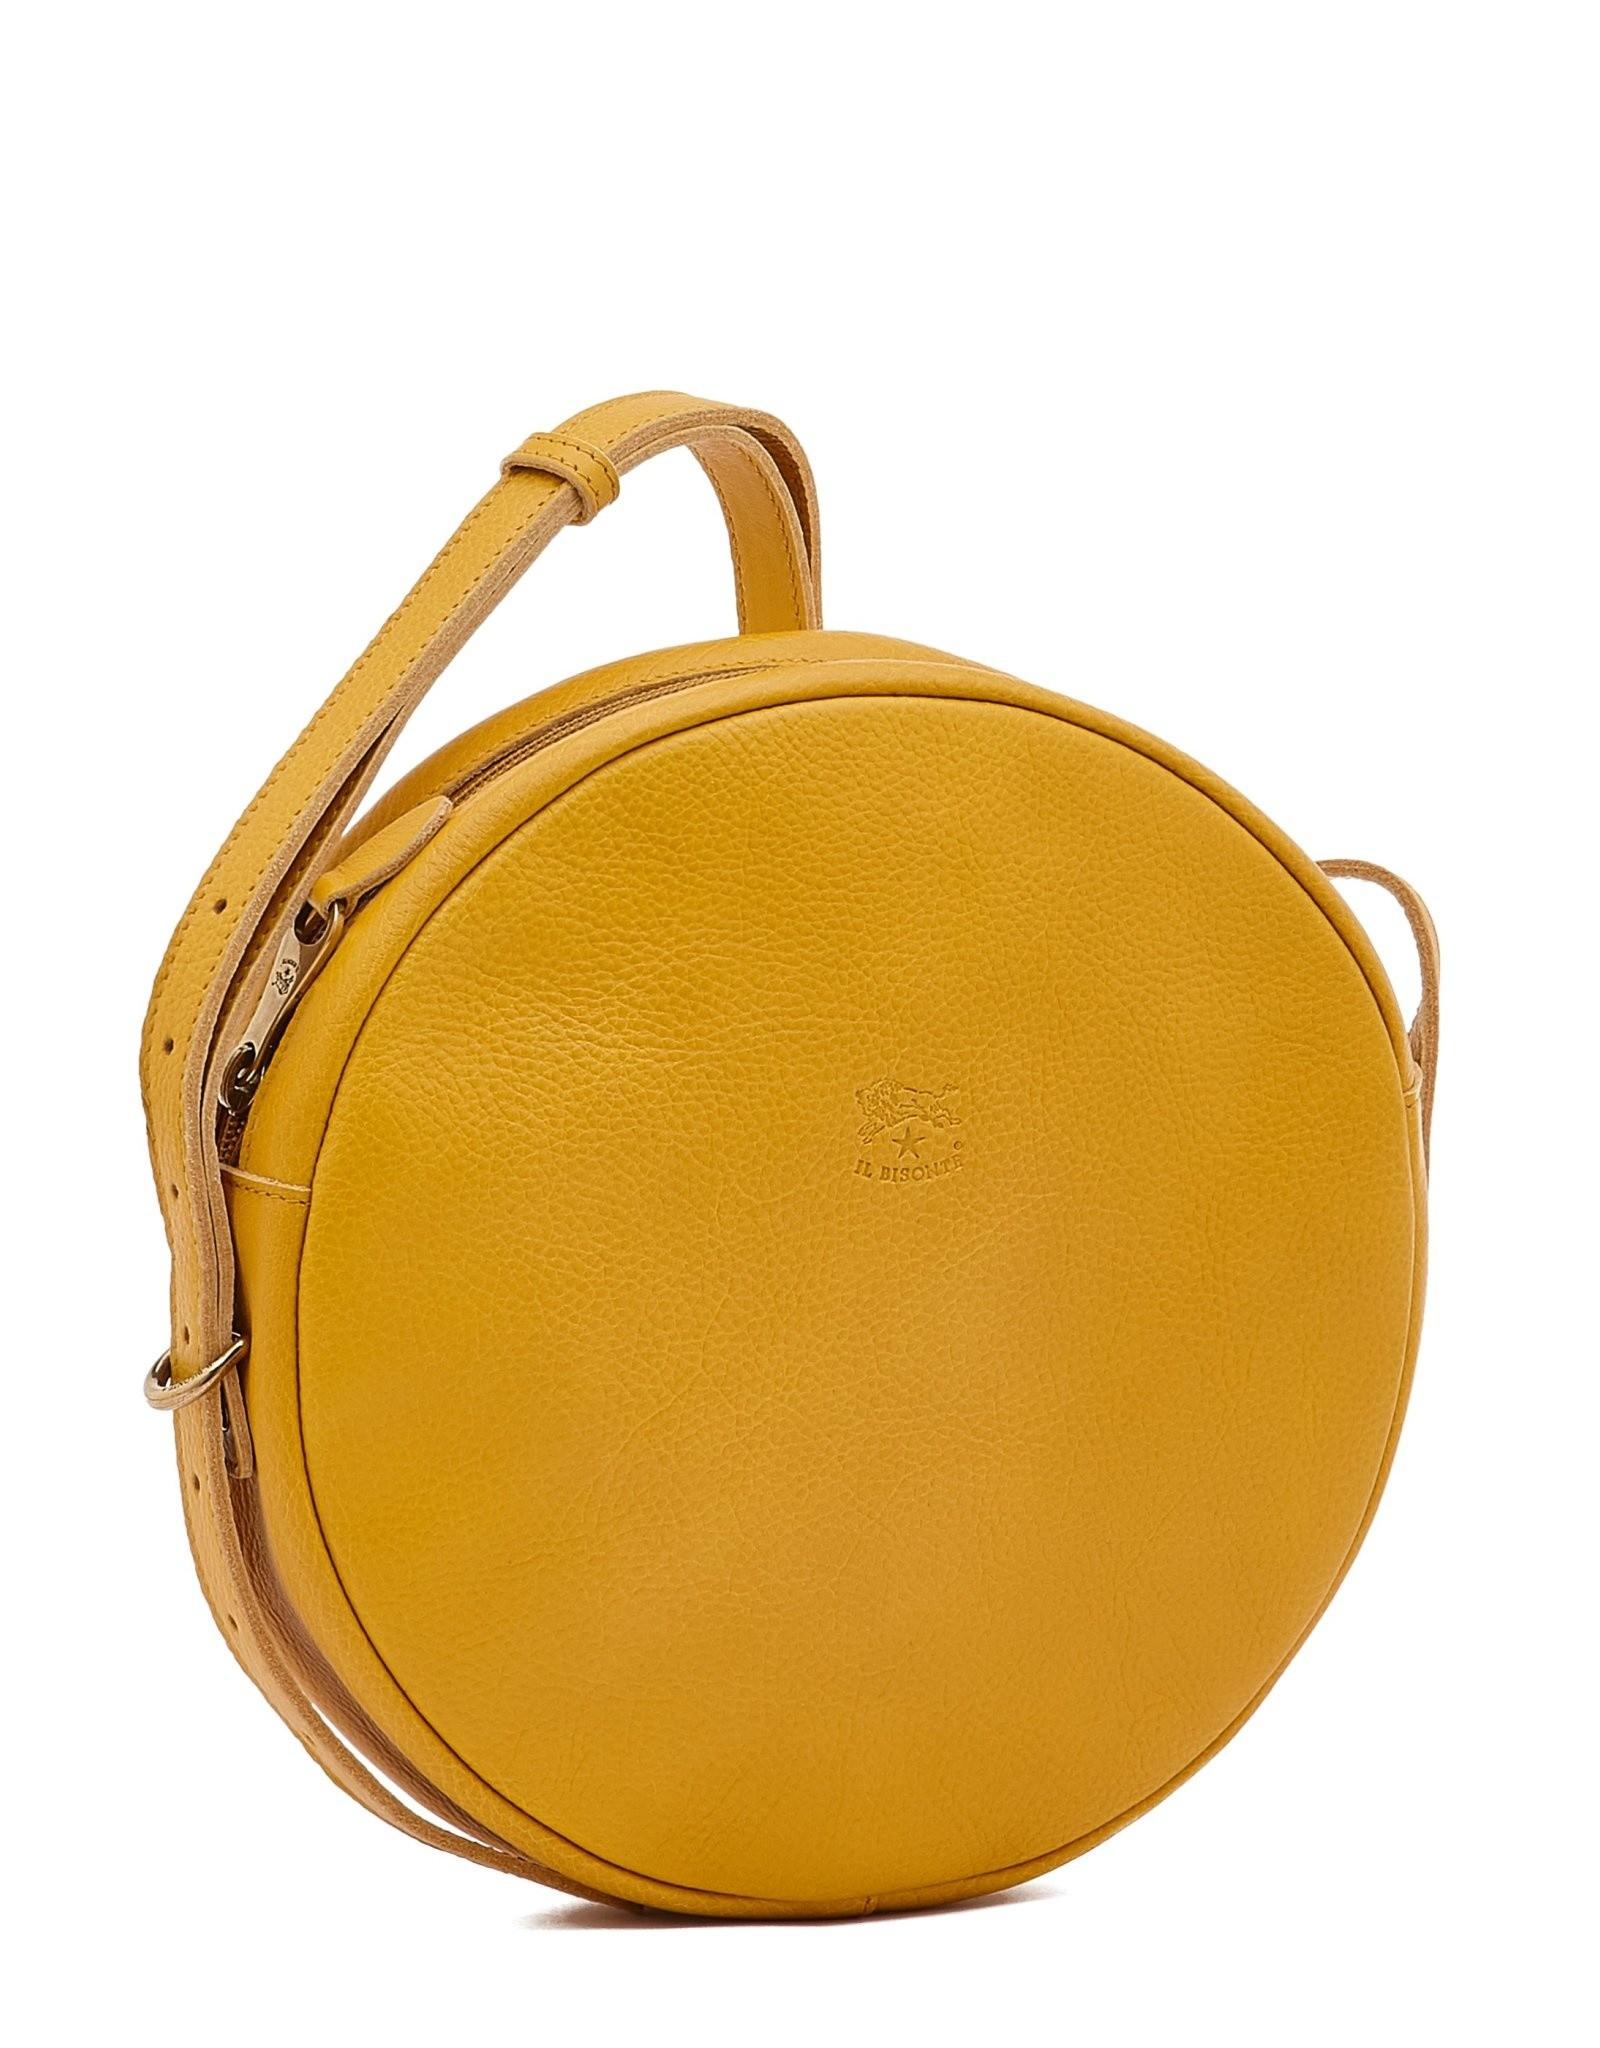 IL BISONTE - The Disco Circle Crossbody Bag